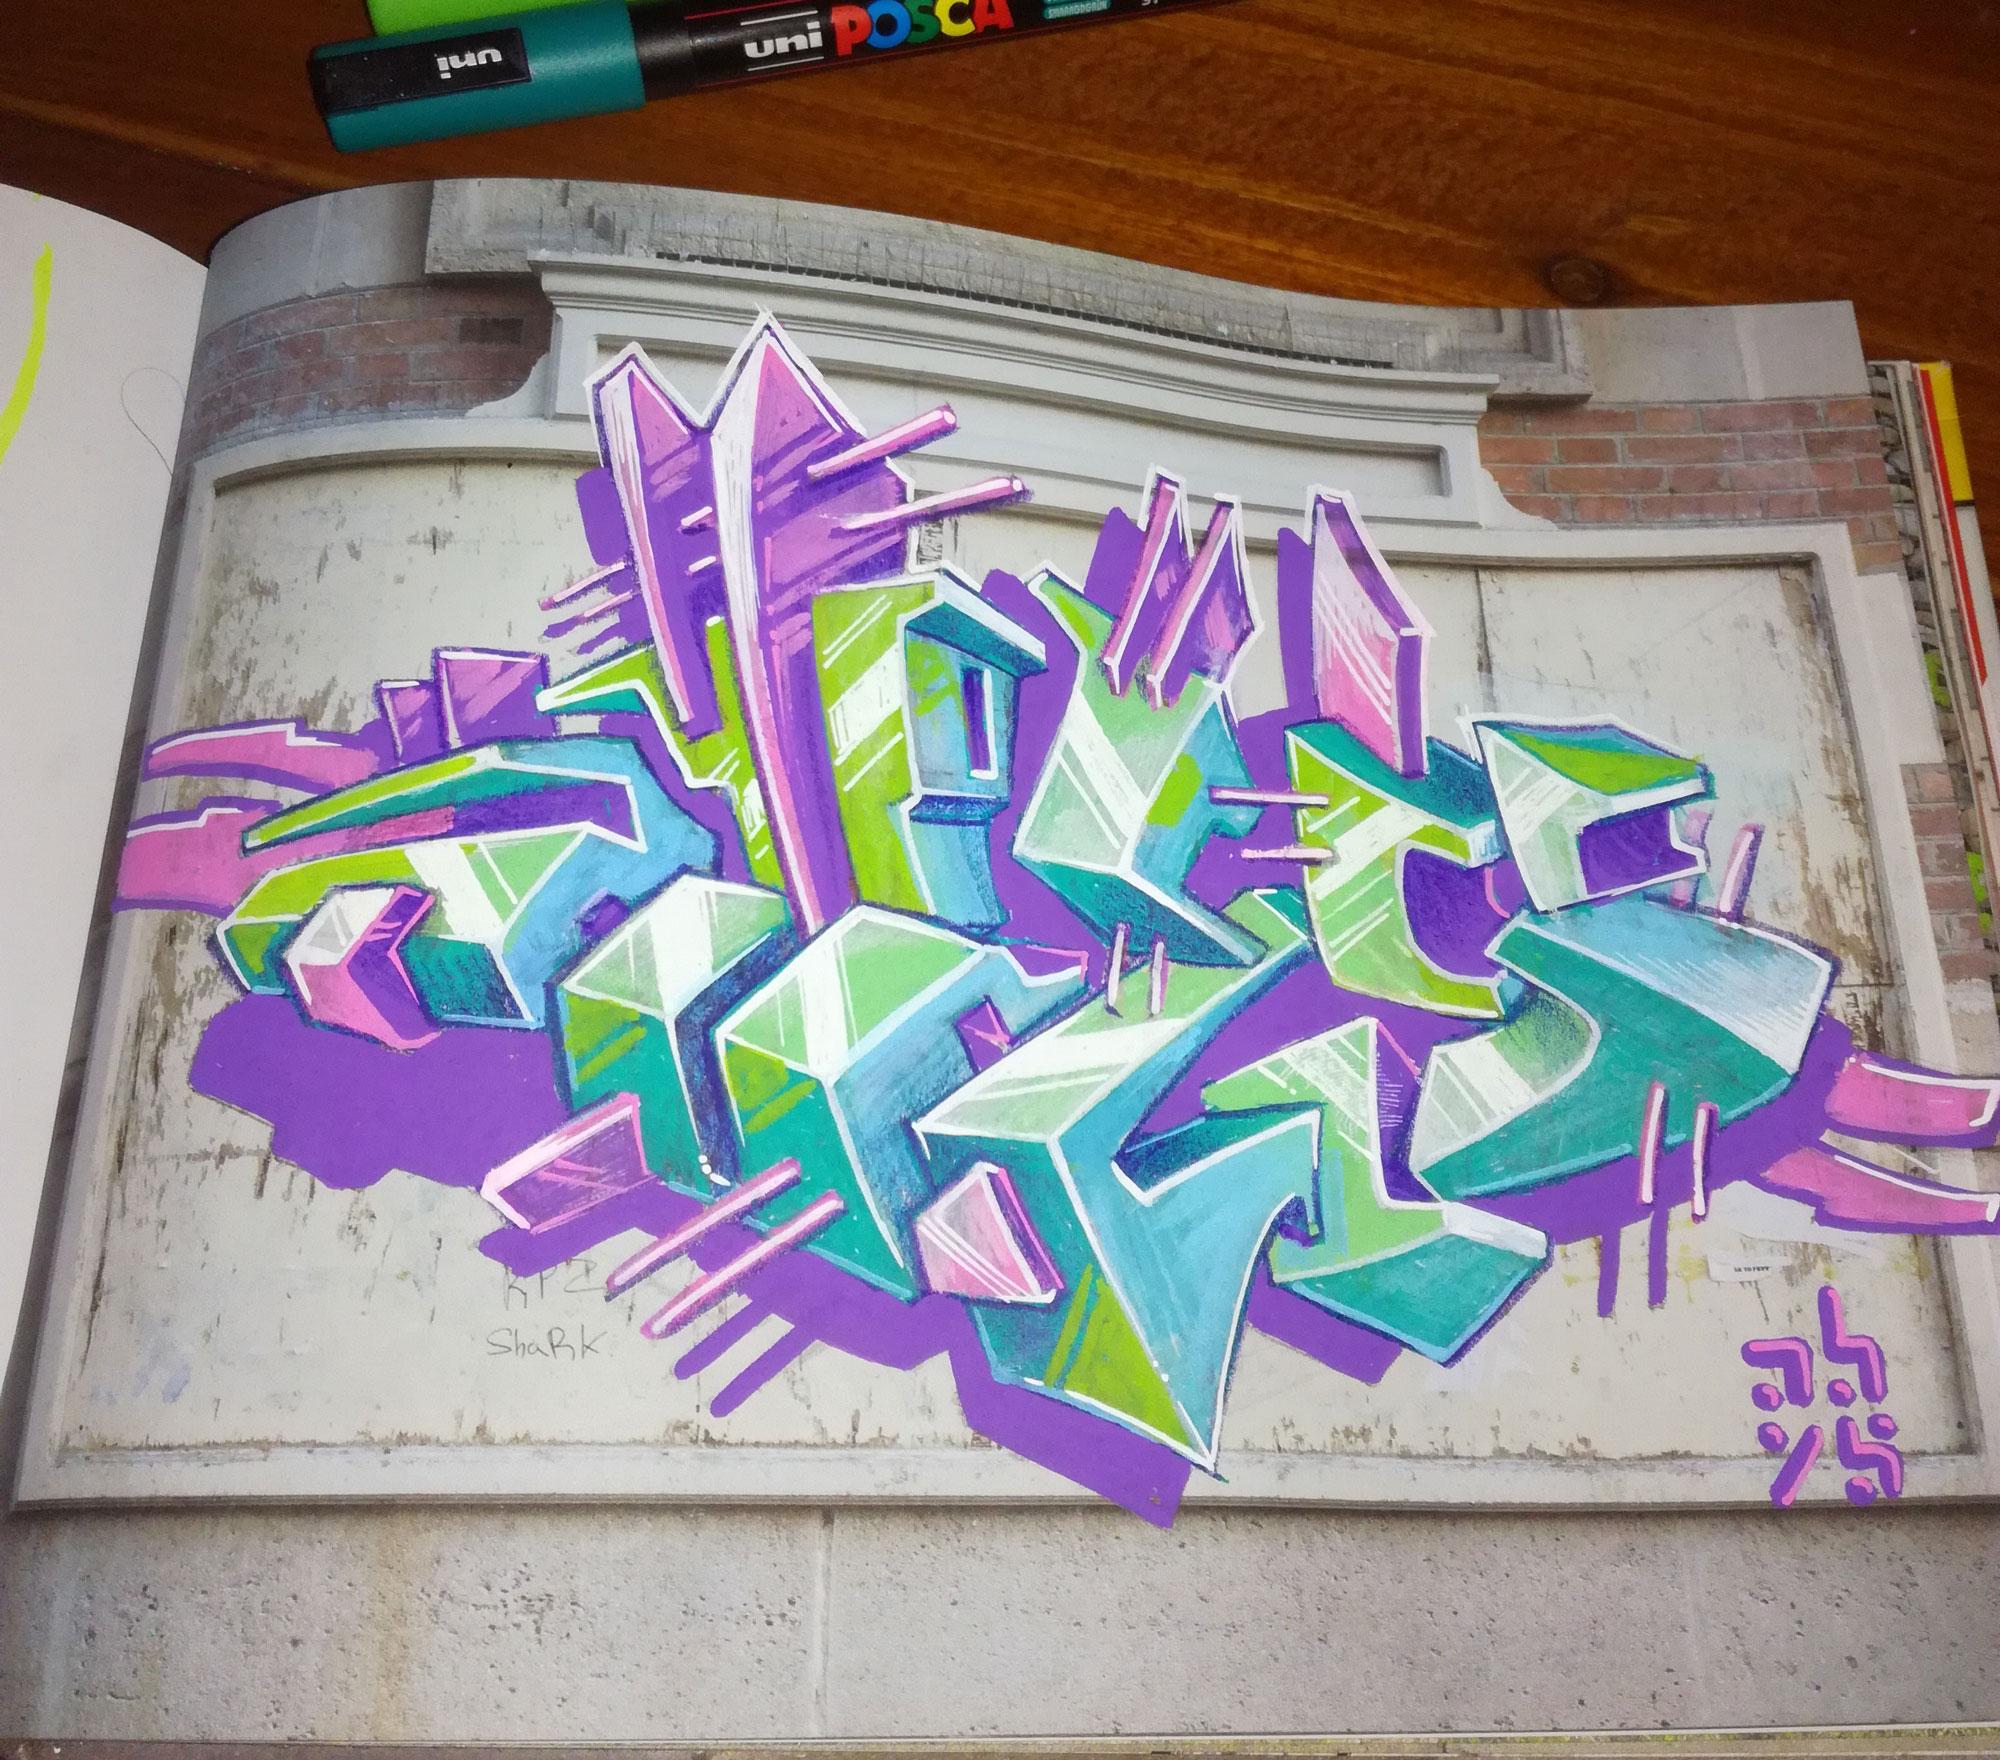 lettrage-abys-posca graffiti art